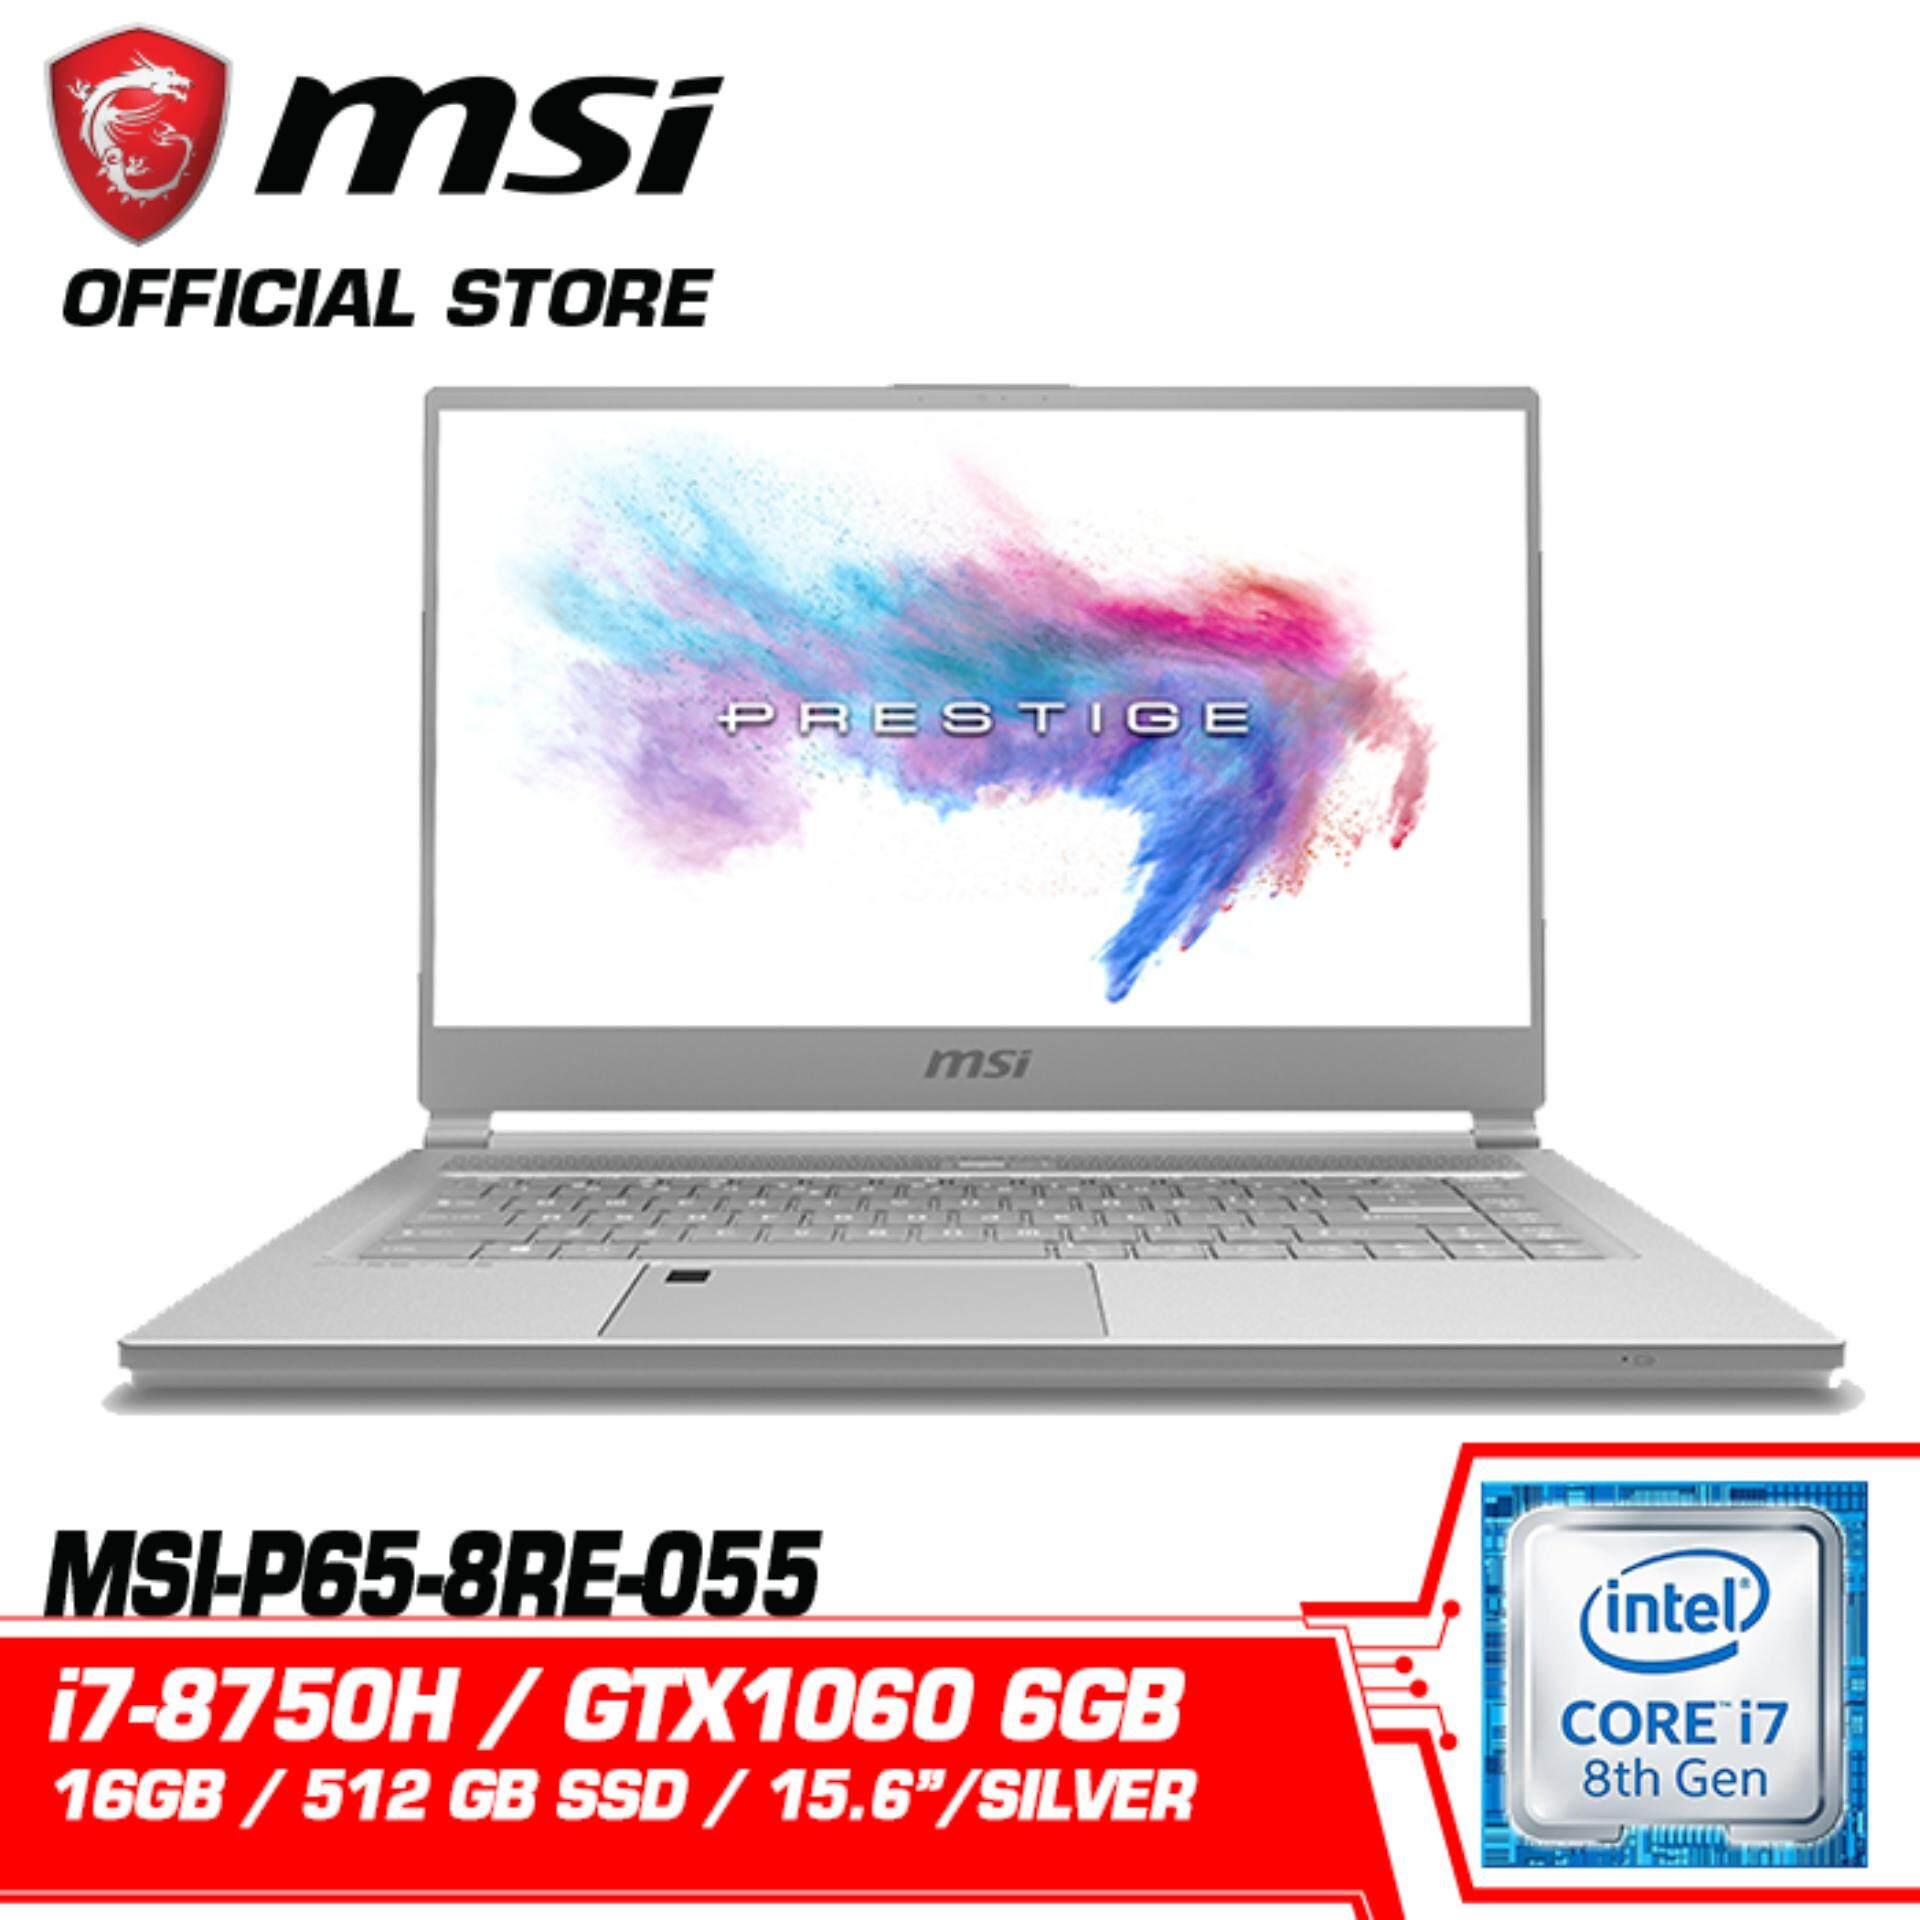 Prestige P65 8RE-055 (GTX1060 6GB GDDR5) Malaysia